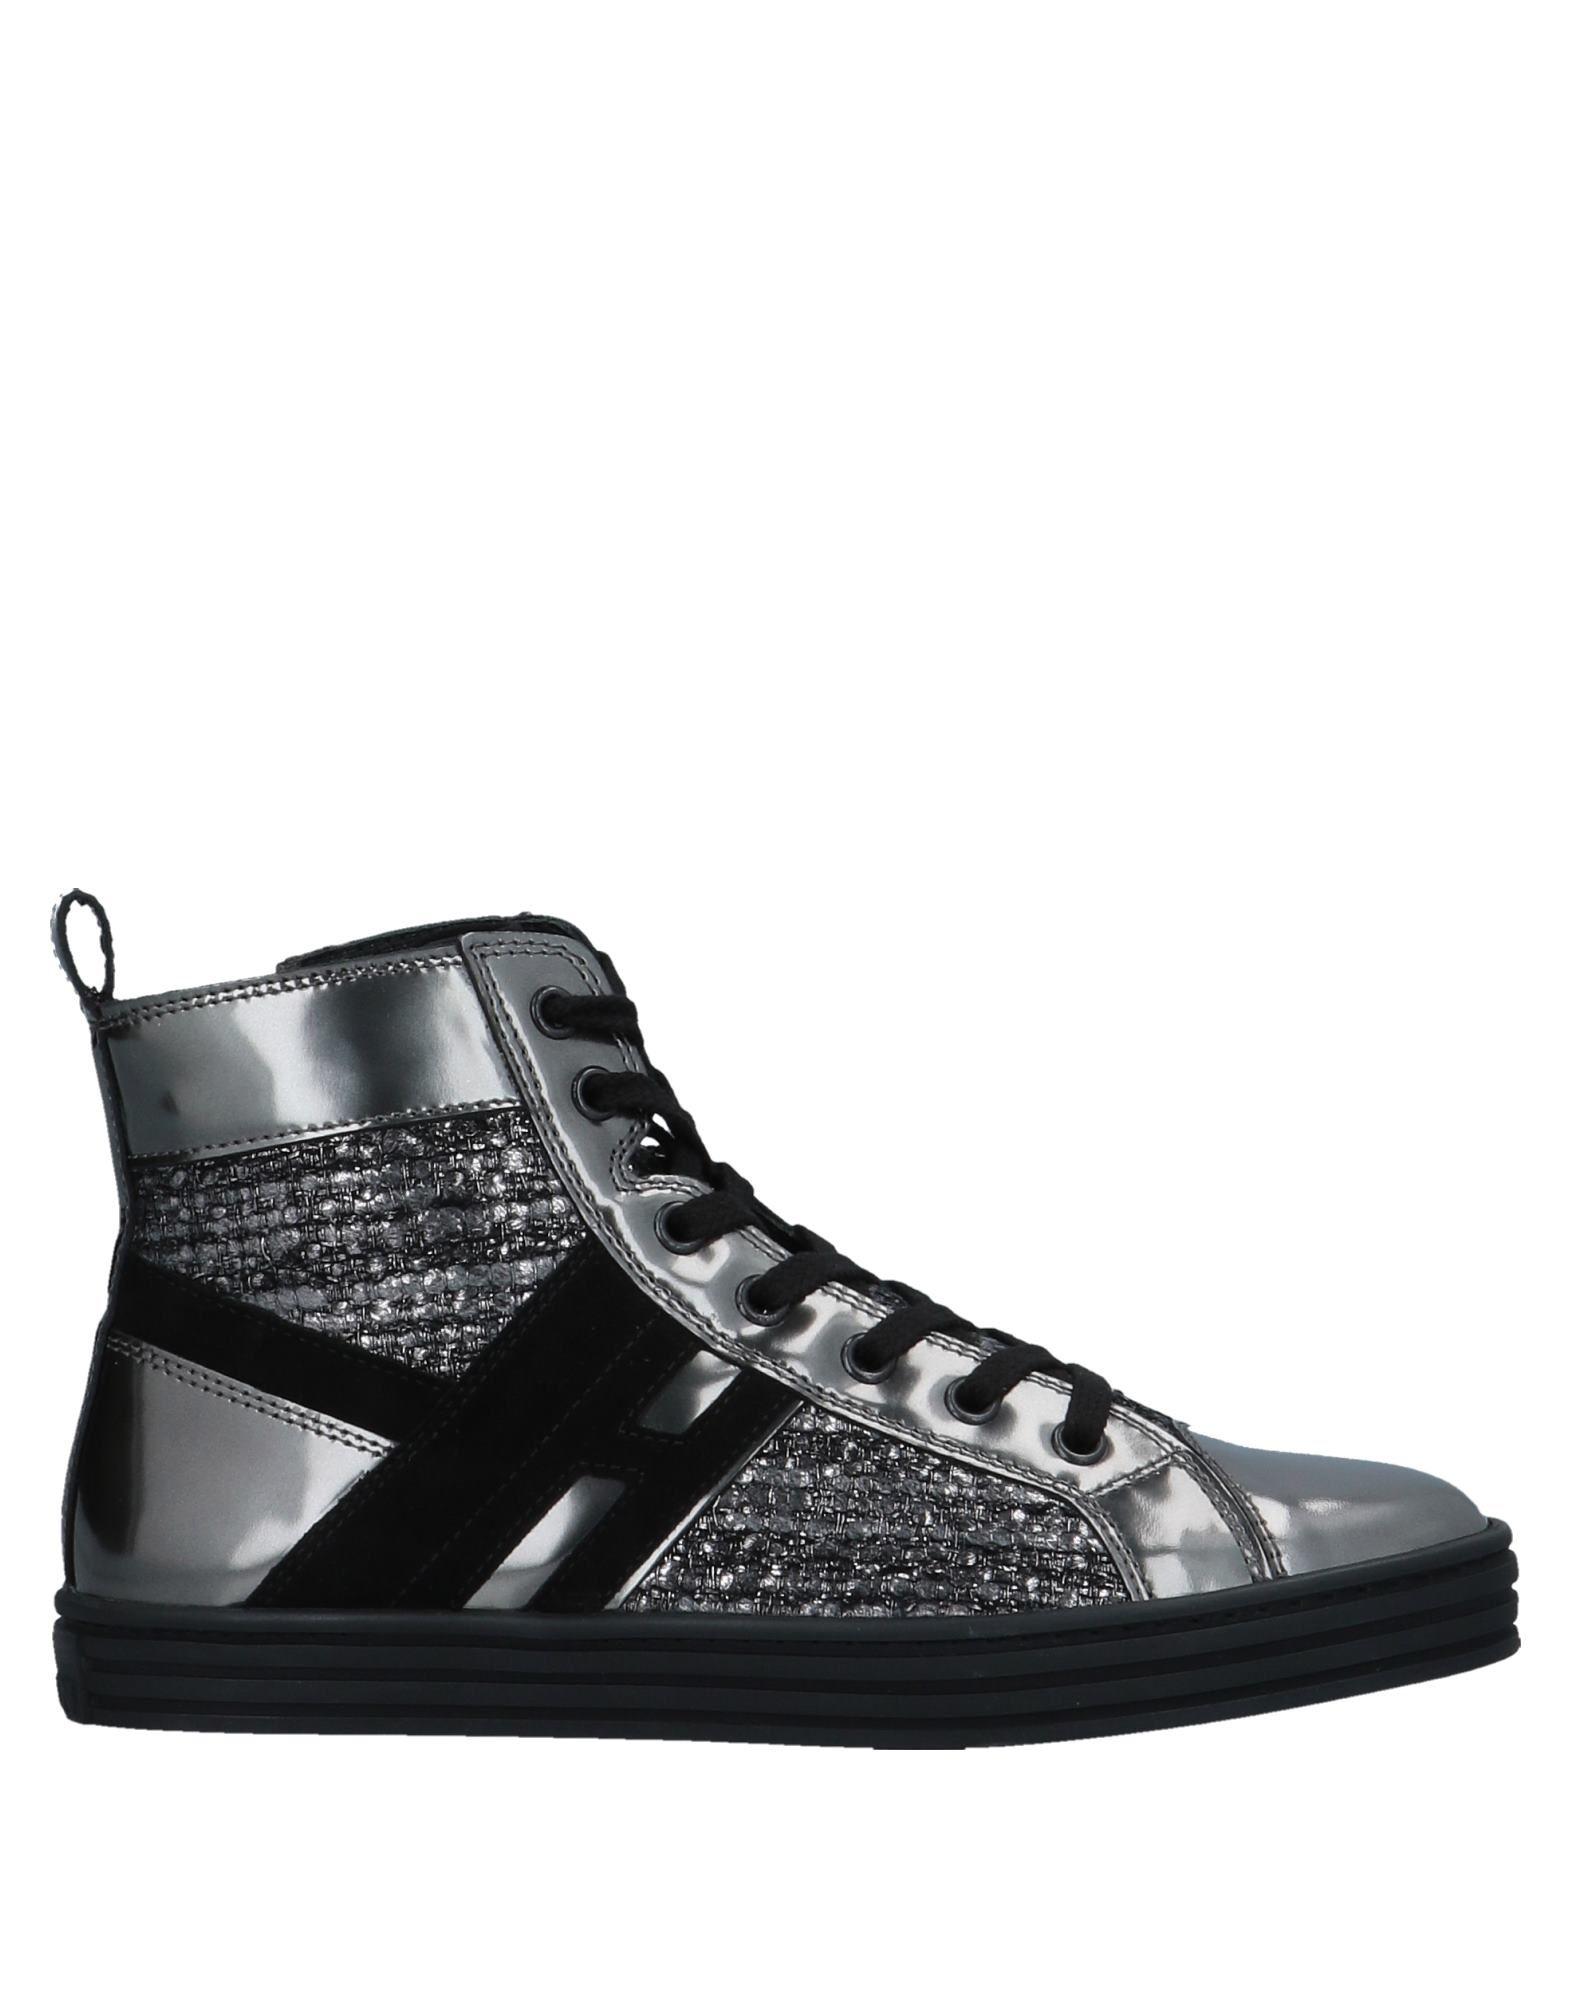 Stilvolle billige Schuhe Schuhe billige Hogan Rebel Turnschuhes Damen 11544031RJ f48a4a